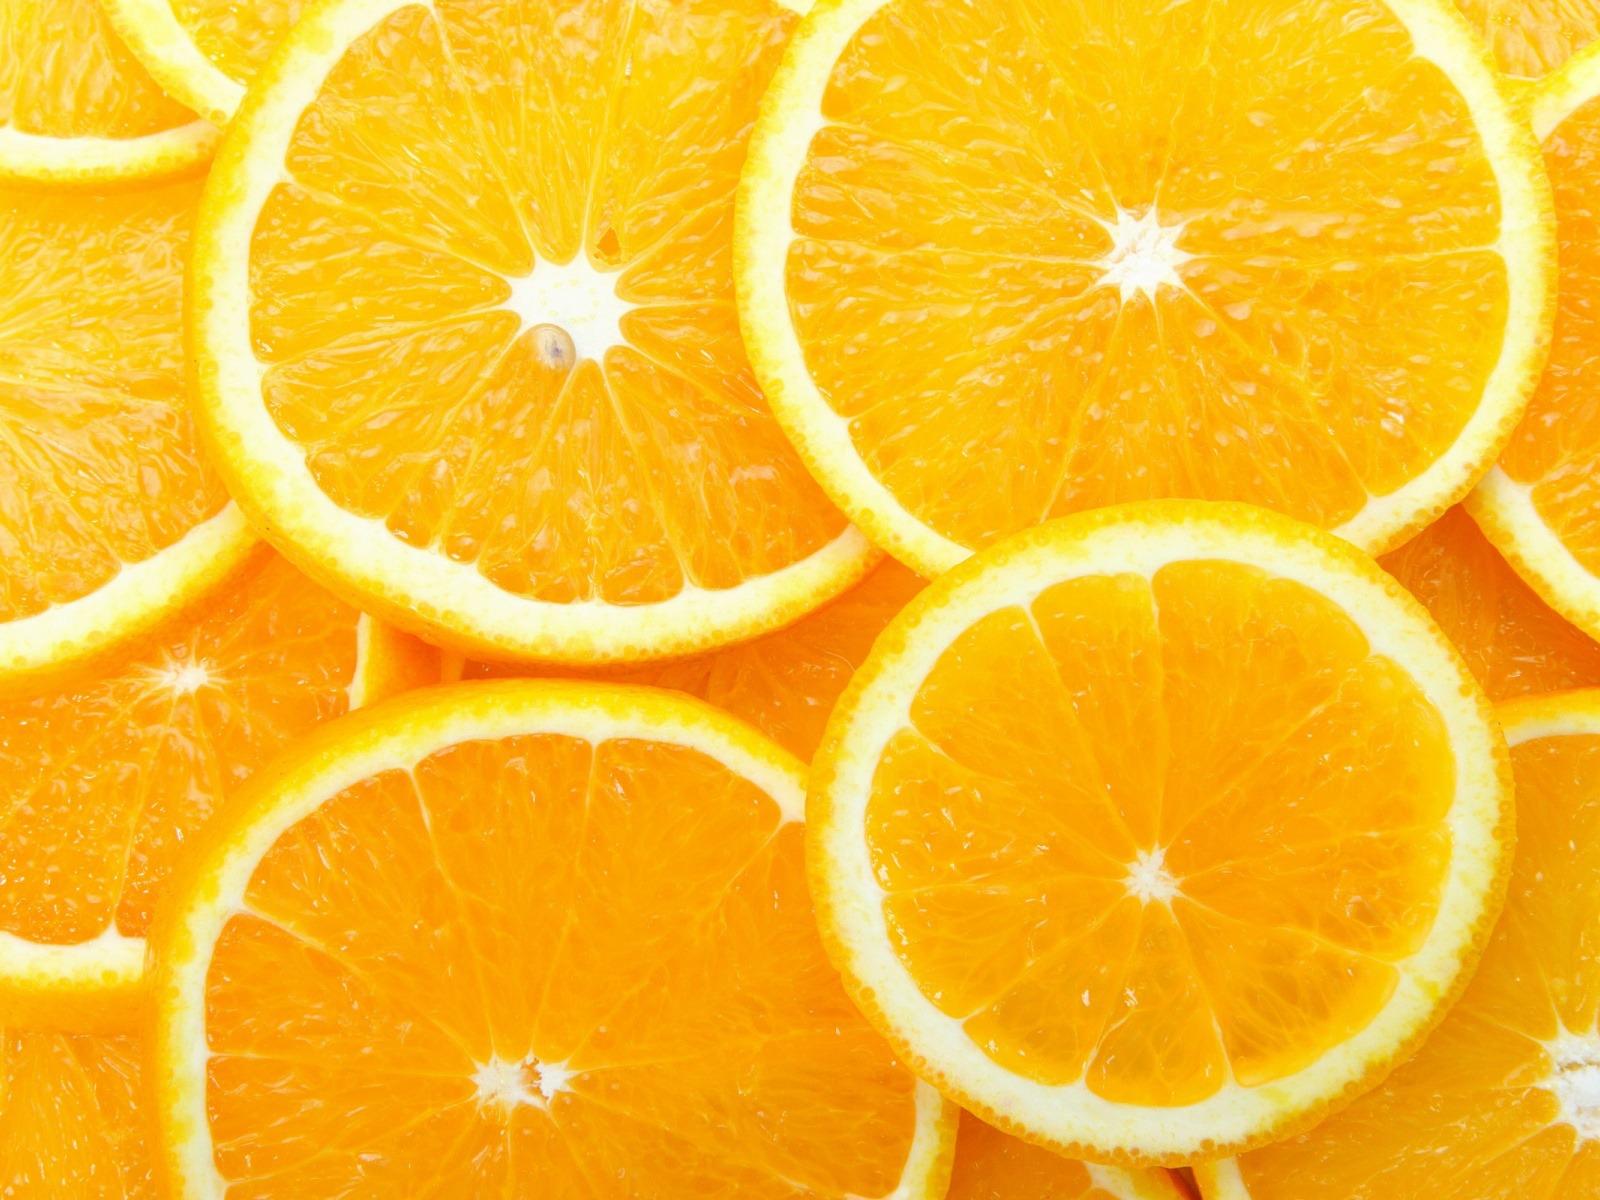 http://2.bp.blogspot.com/-txPzReADais/TWduO8bRCpI/AAAAAAAADdg/iSsvKMIR1Iw/s1600/Oranje-achtergronden-oranje-wallpapers-oranje-wallpaper-hd-7.jpg